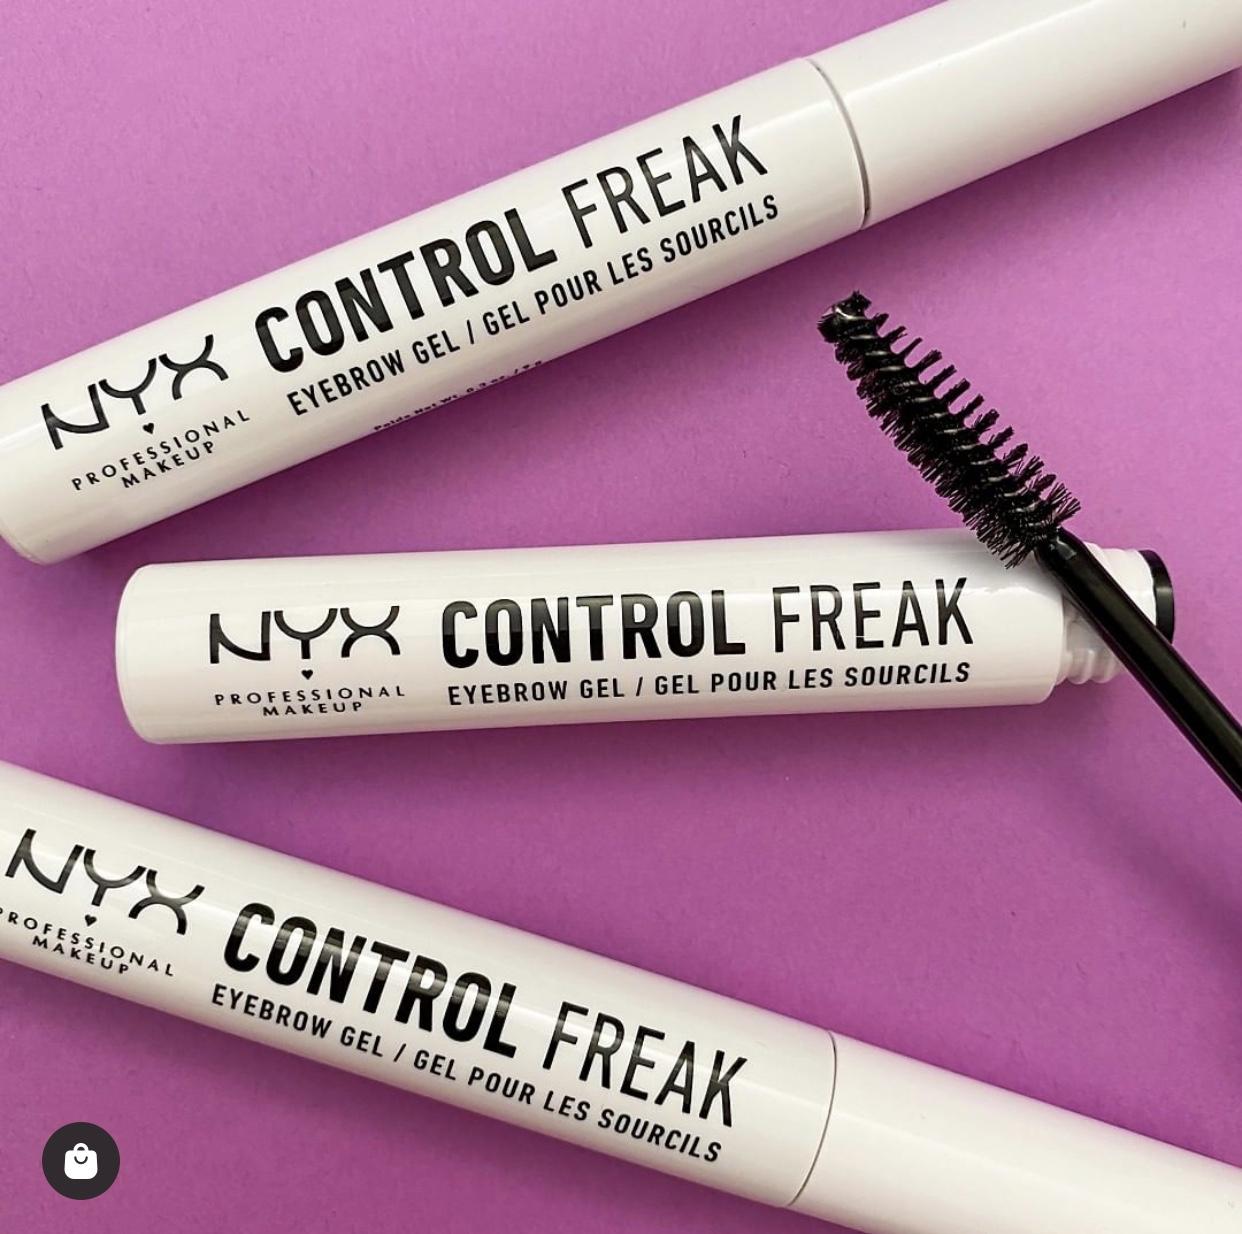 NYX Cosmetics Control Freak Eyebrow Gel